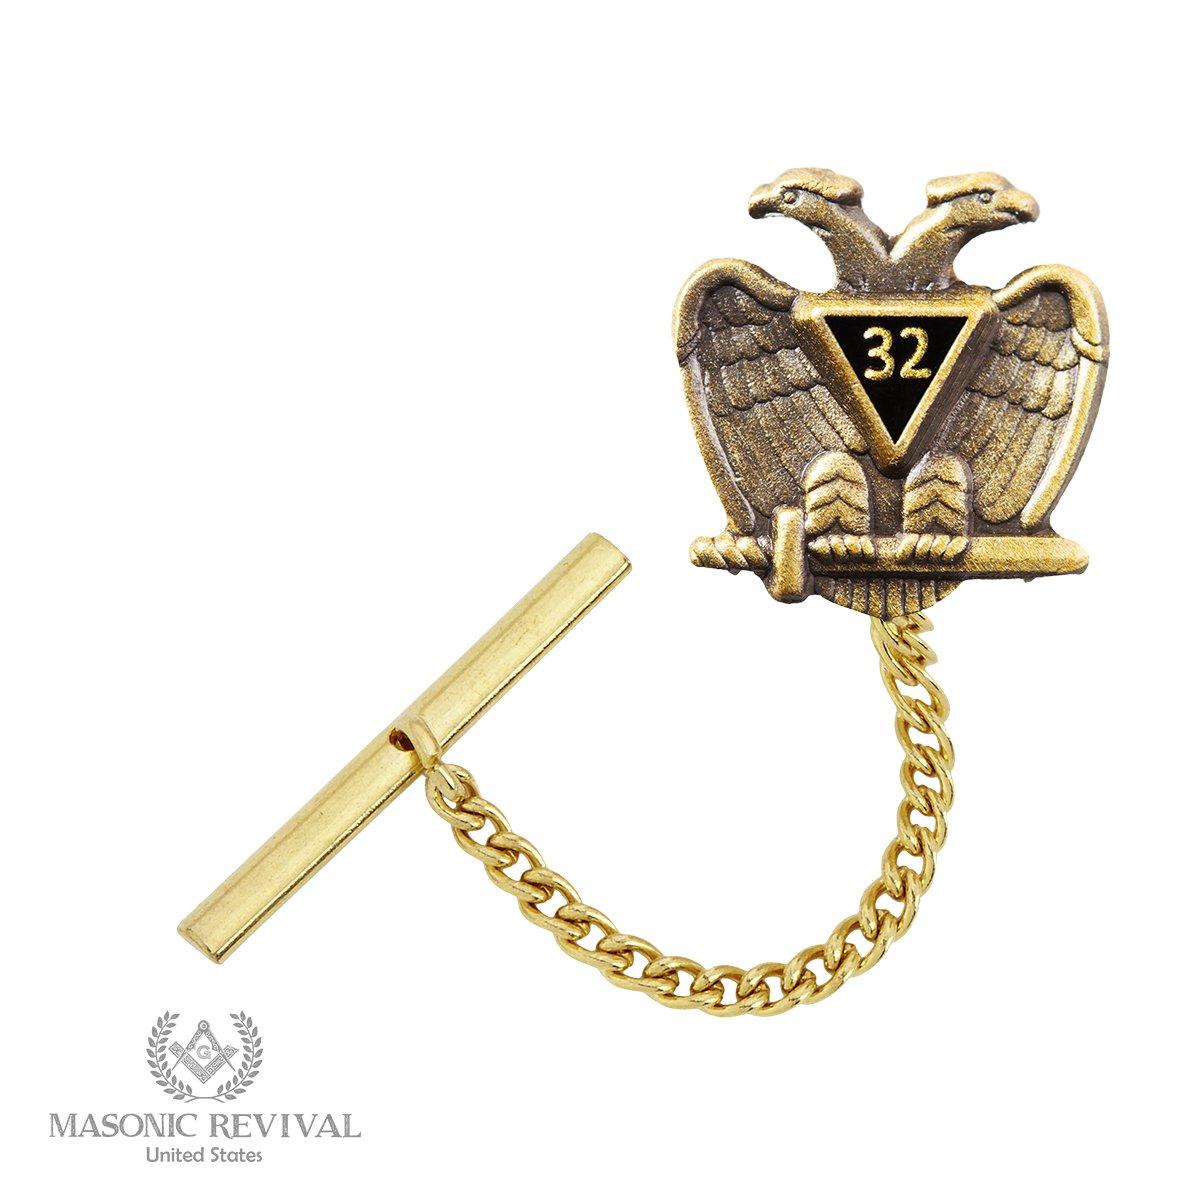 Grau32 Scottish Rite Tie Pin Tack by Masonic Revival (Antique Gold)